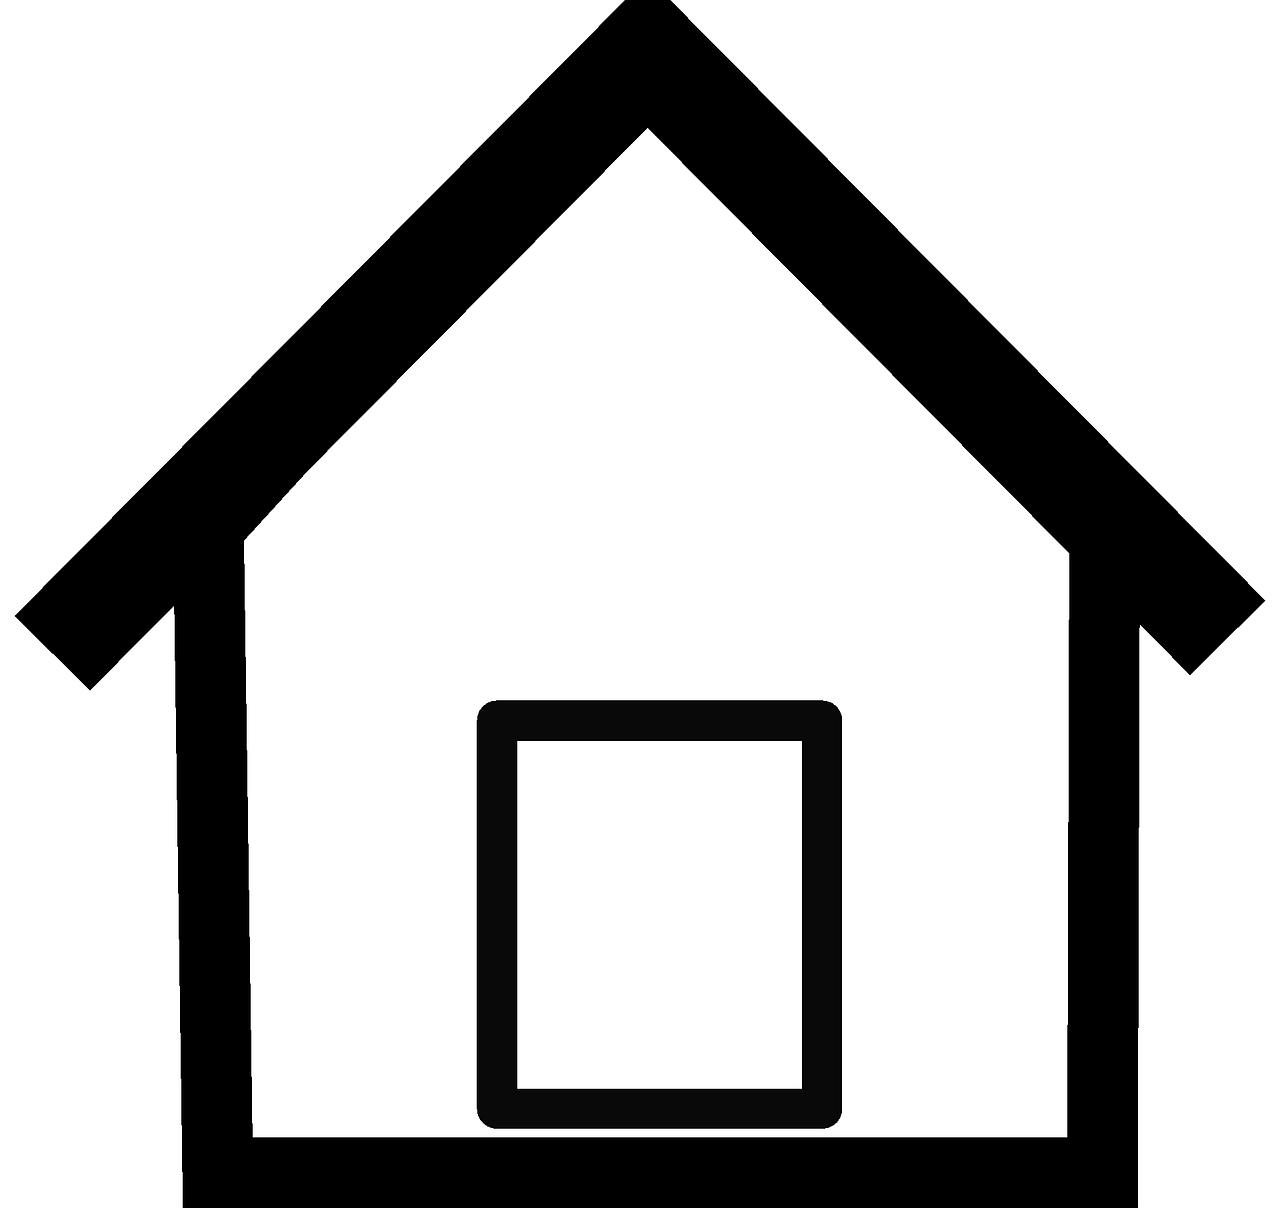 house-150151_1280